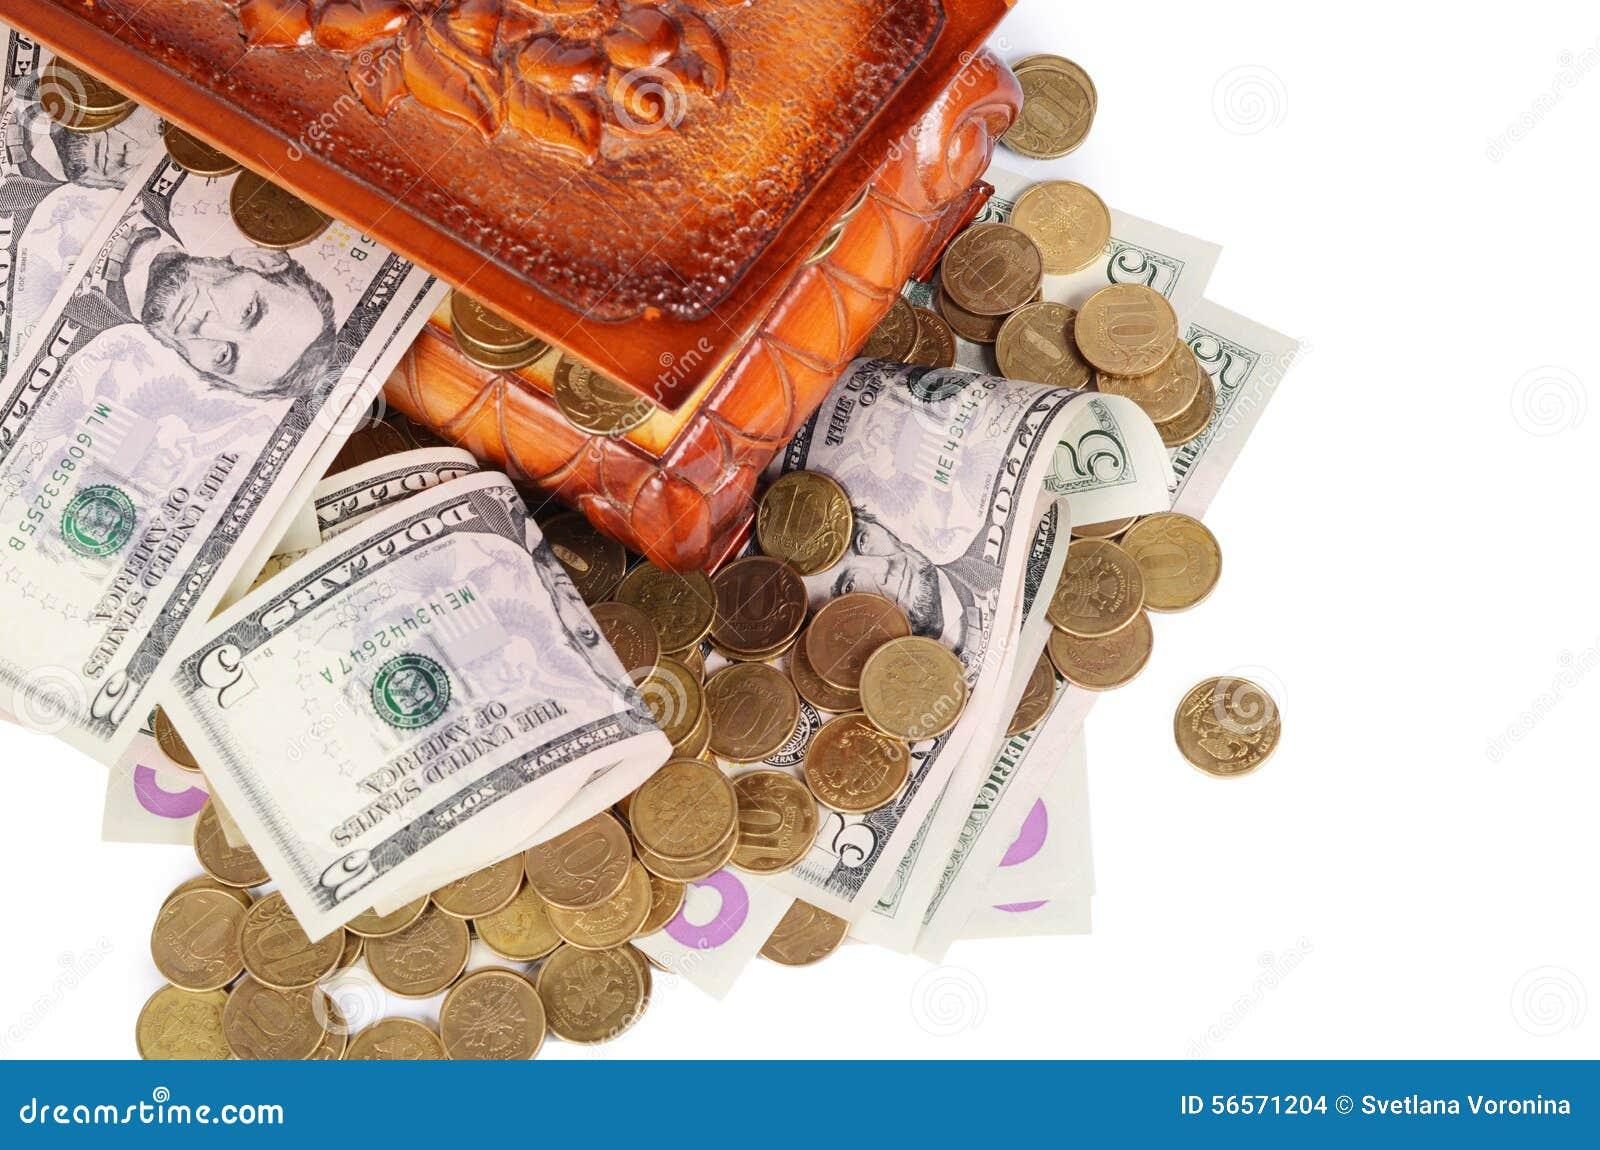 Download Νομίσματα και τραπεζογραμμάτια στο κιβώτιο Στοκ Εικόνες - εικόνα από απομονωμένος, τύχη: 56571204